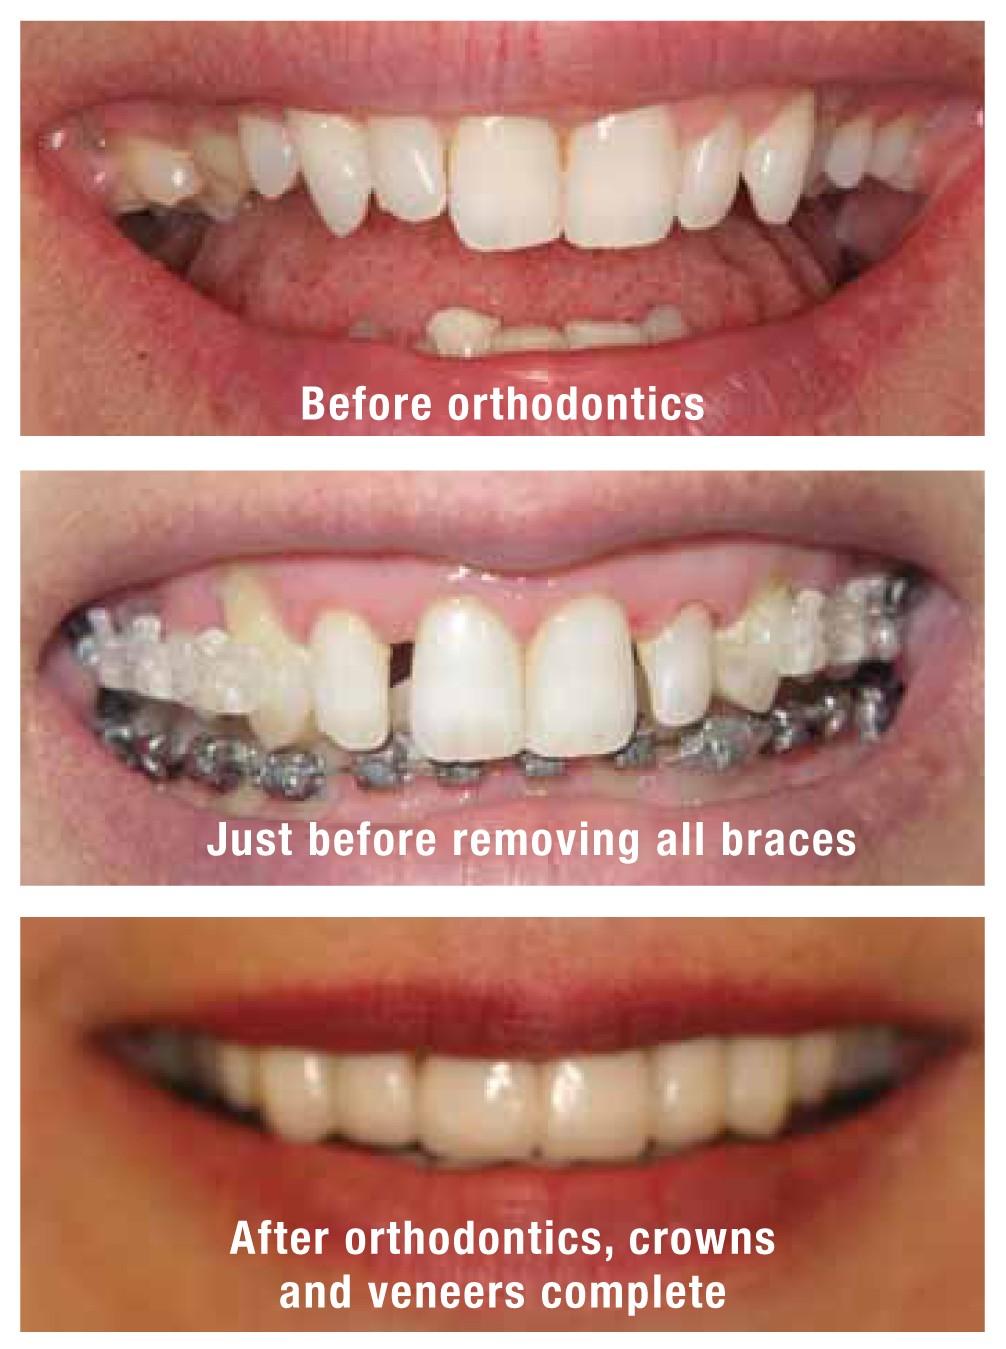 anna_giacalone_dentist_case_3_amj15